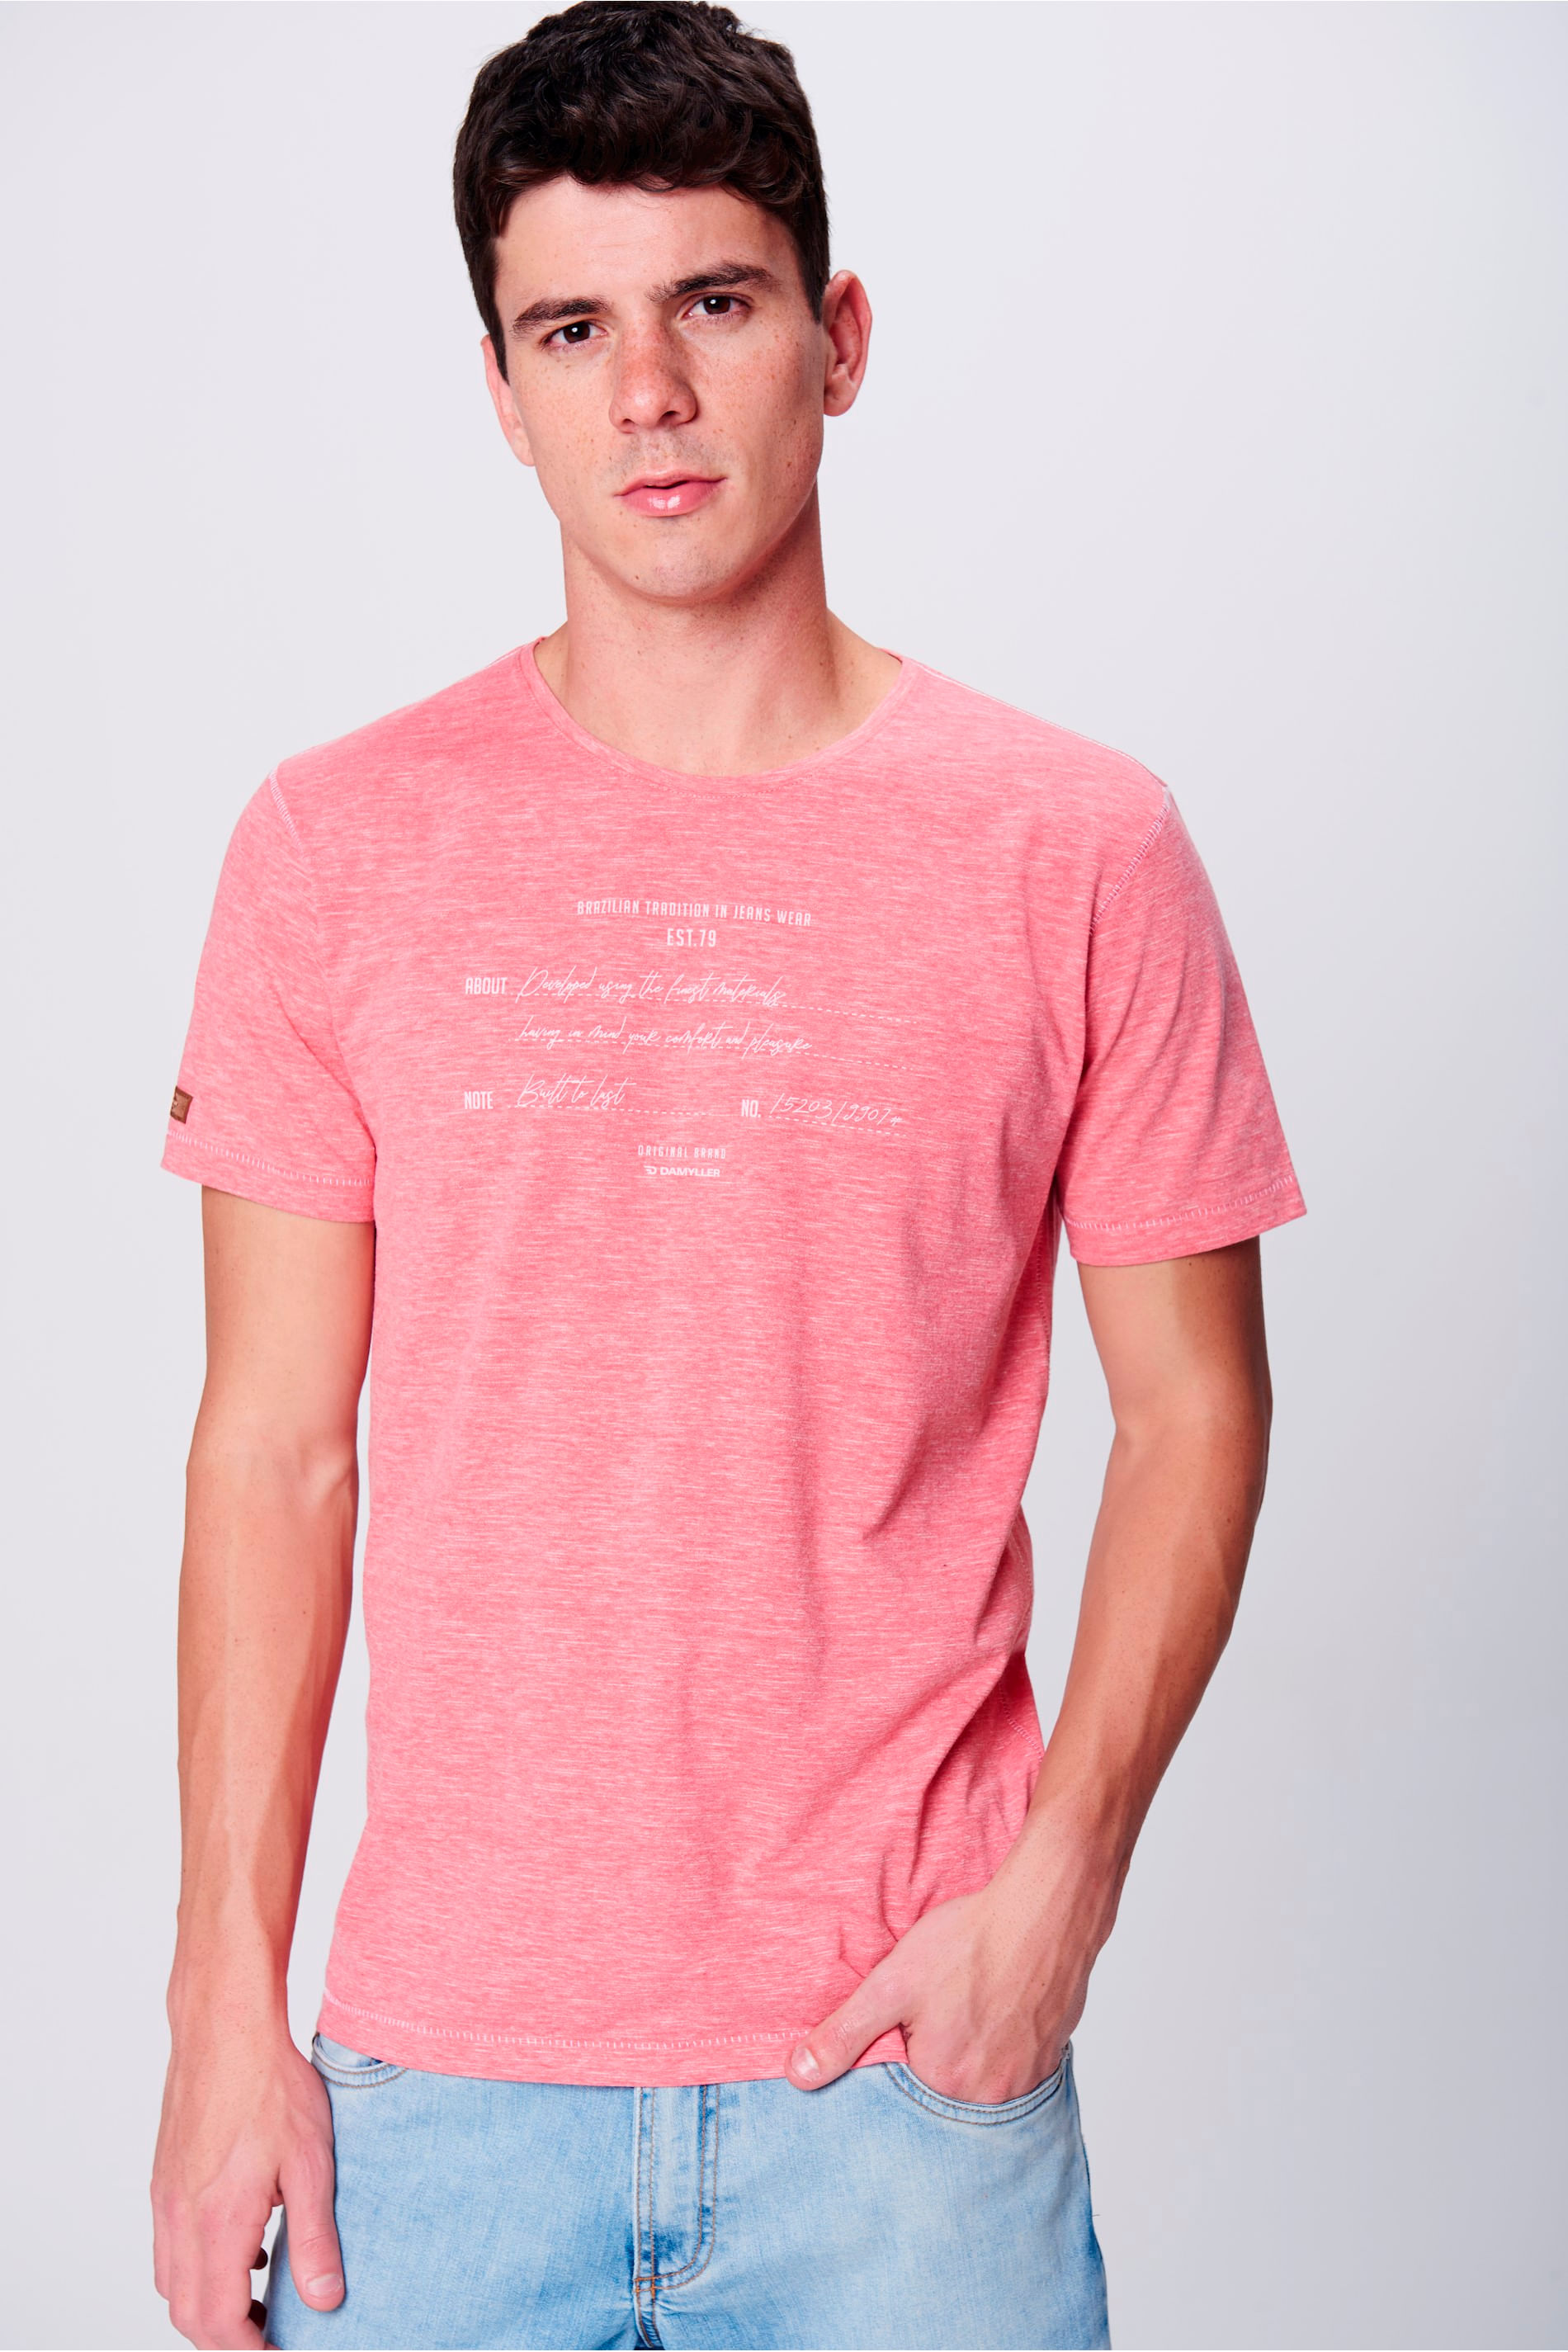 Camiseta Malha Devorê Masculina - Damyller c5067bbb84d4a